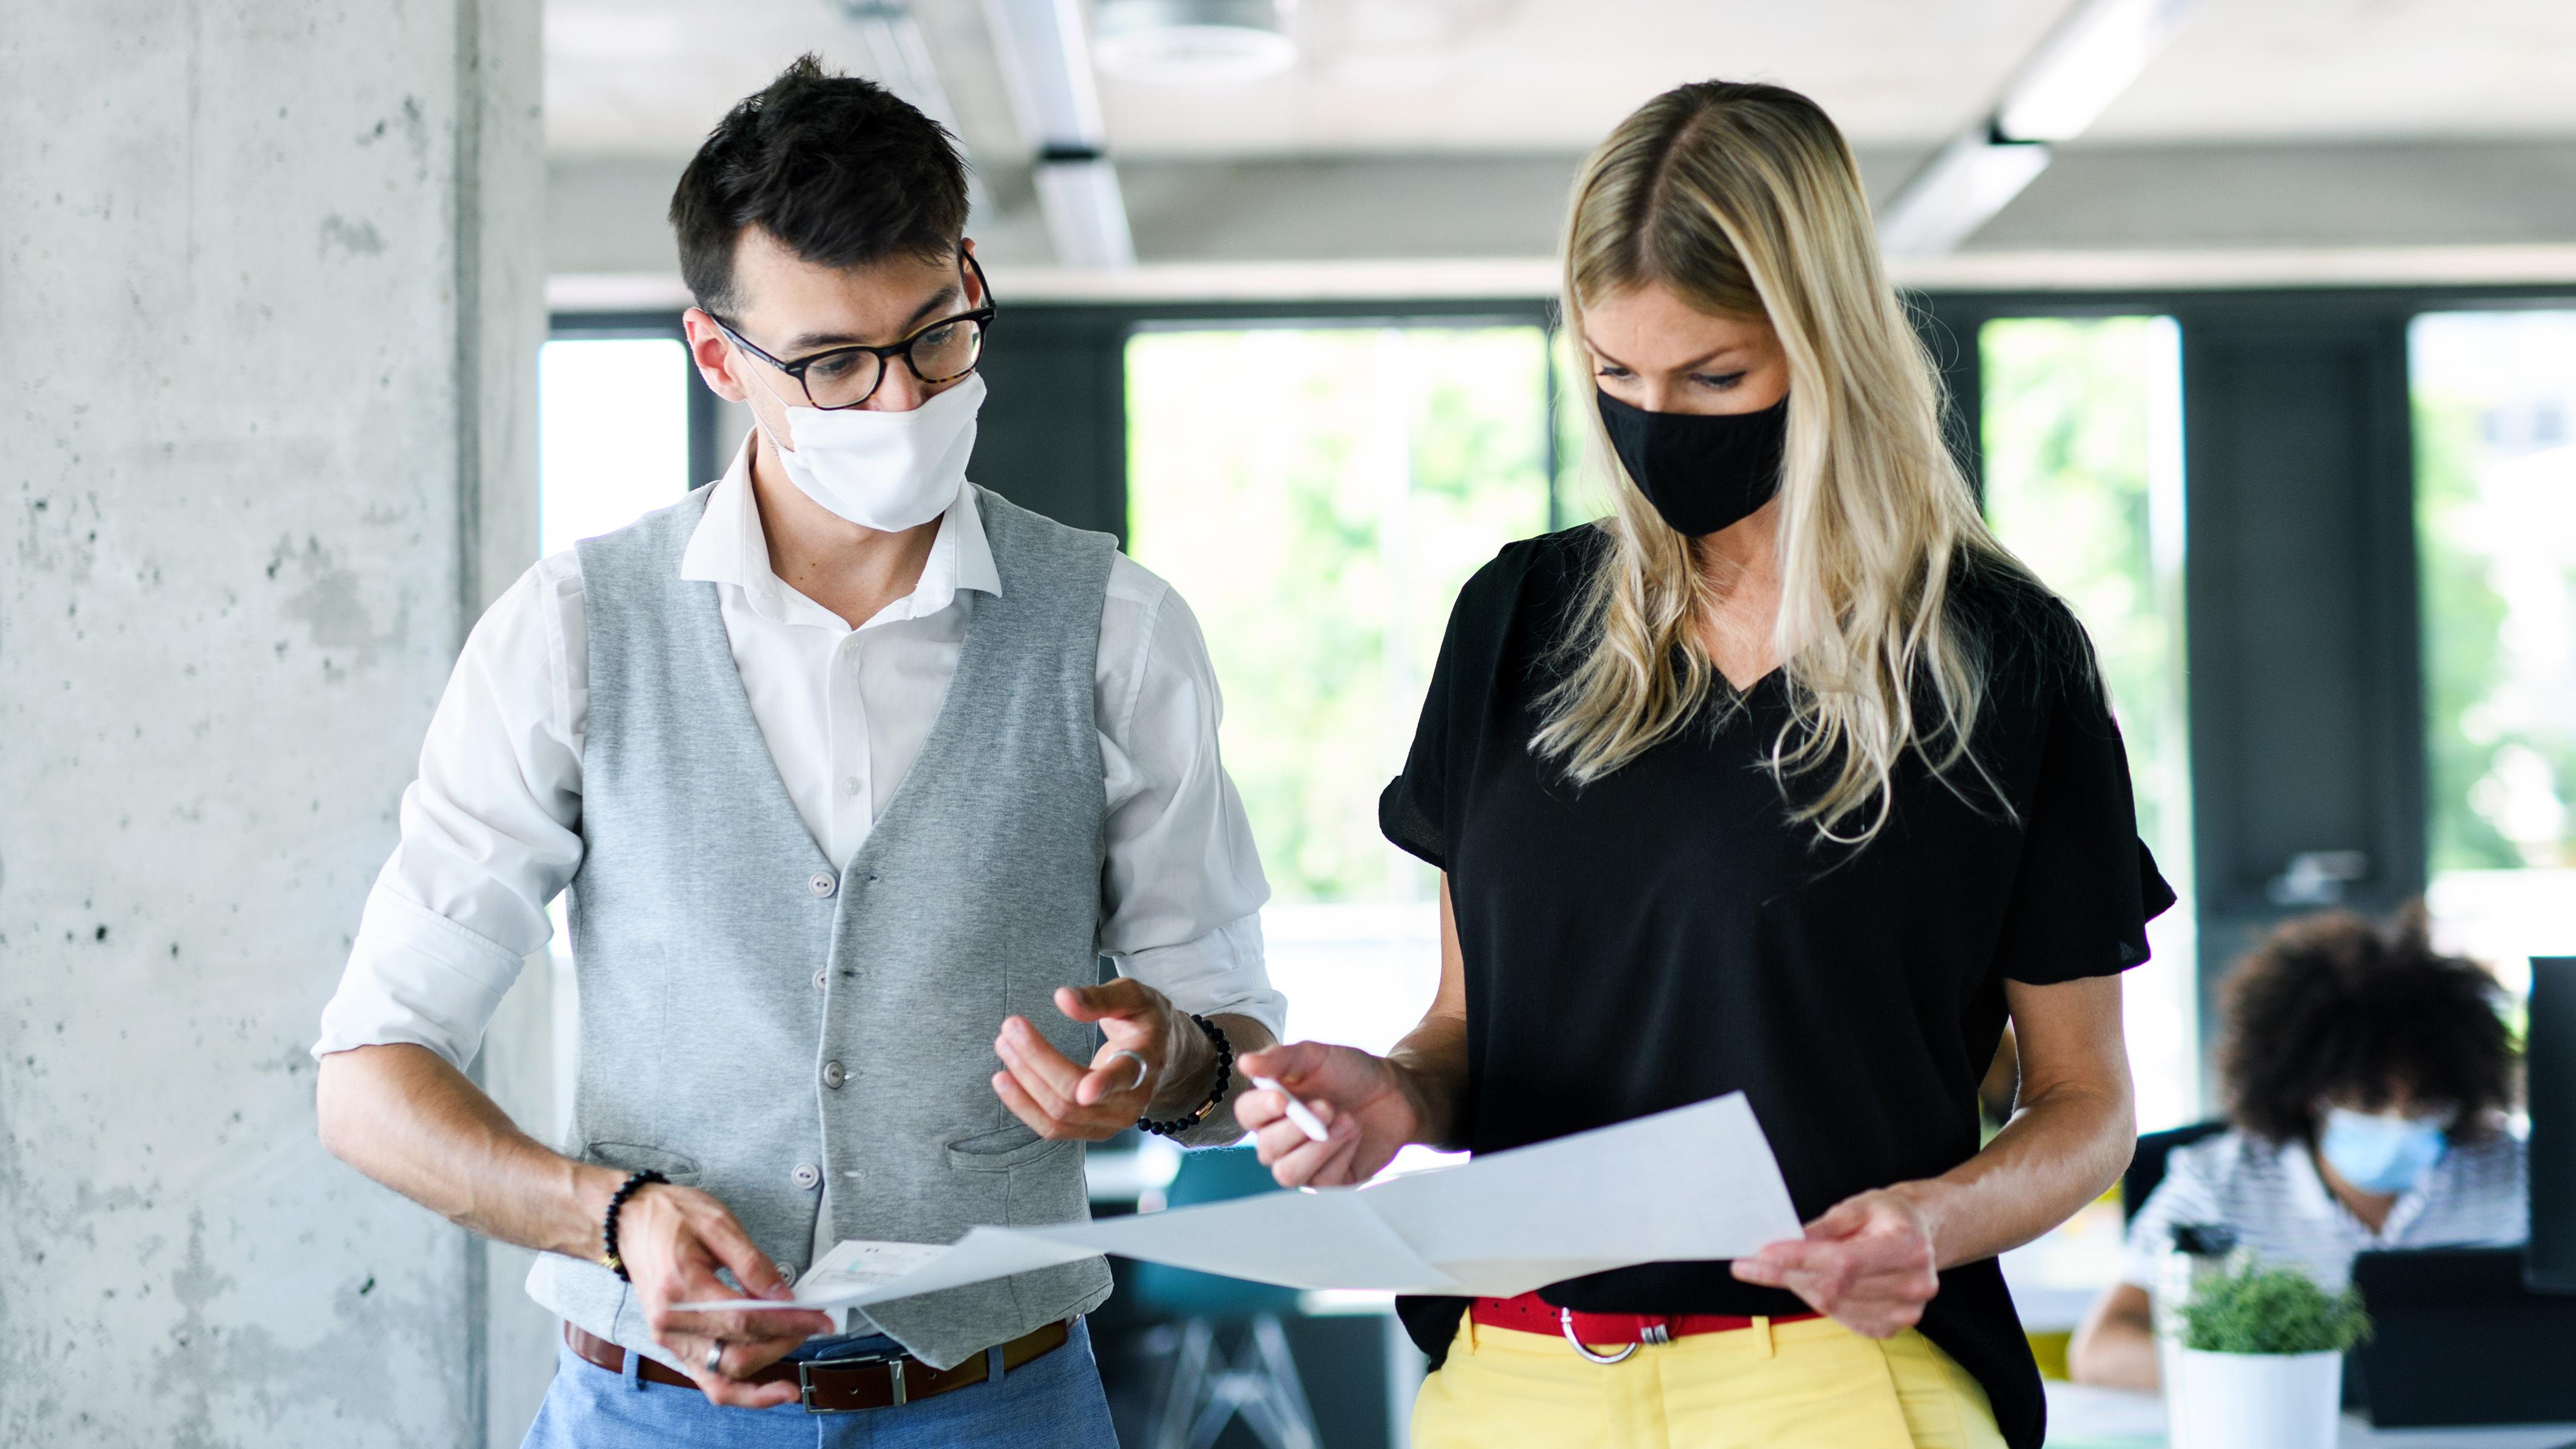 Hybrid Workplace Employee Collaboration